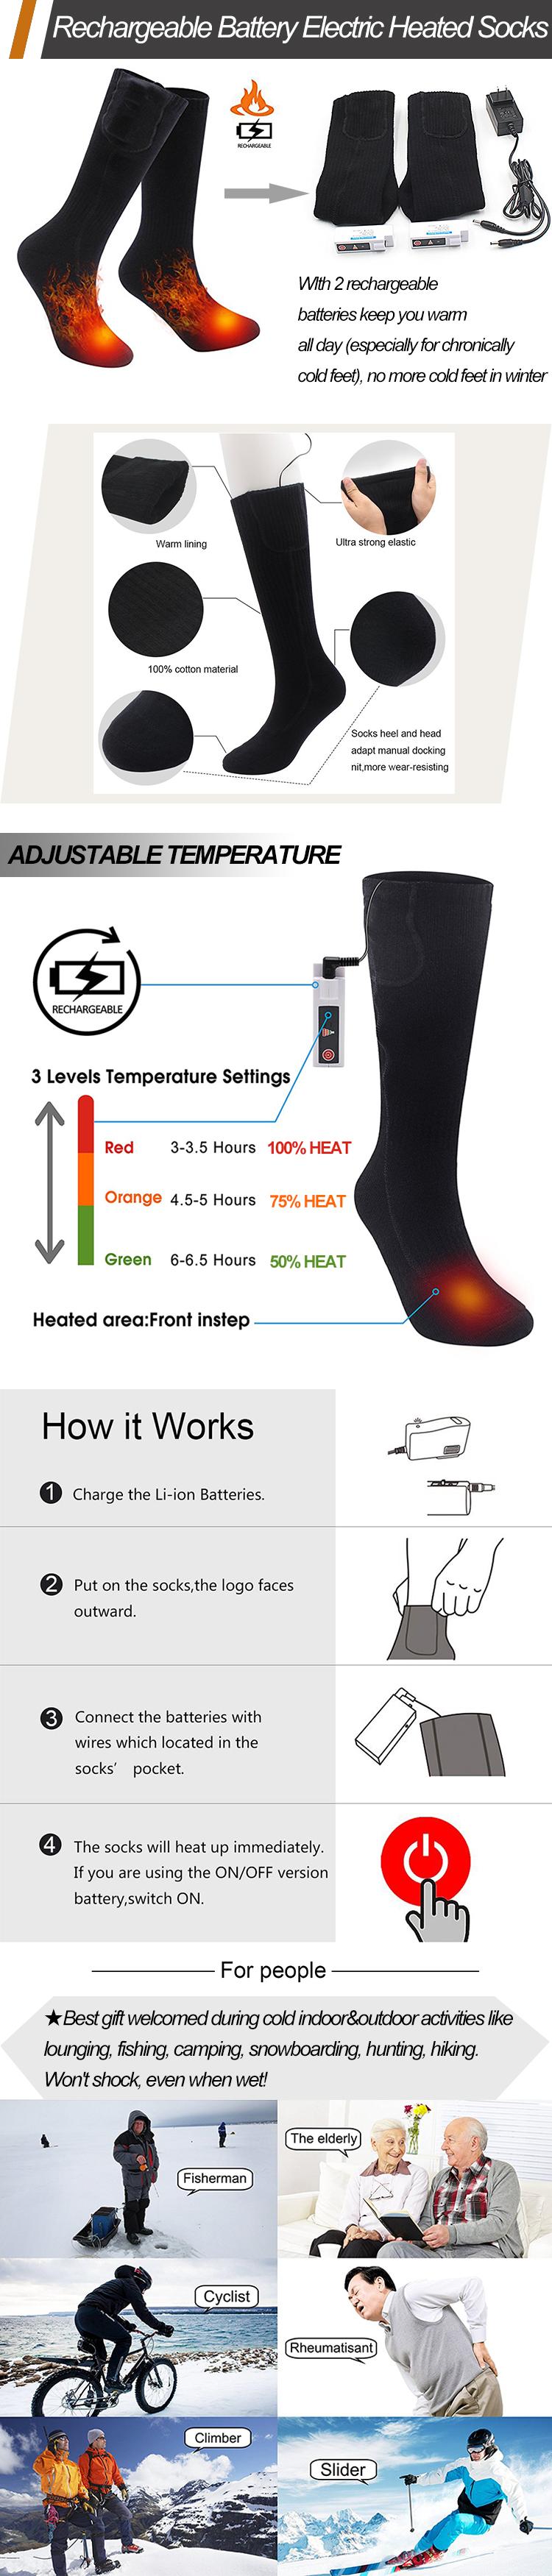 Electric Heated Socks